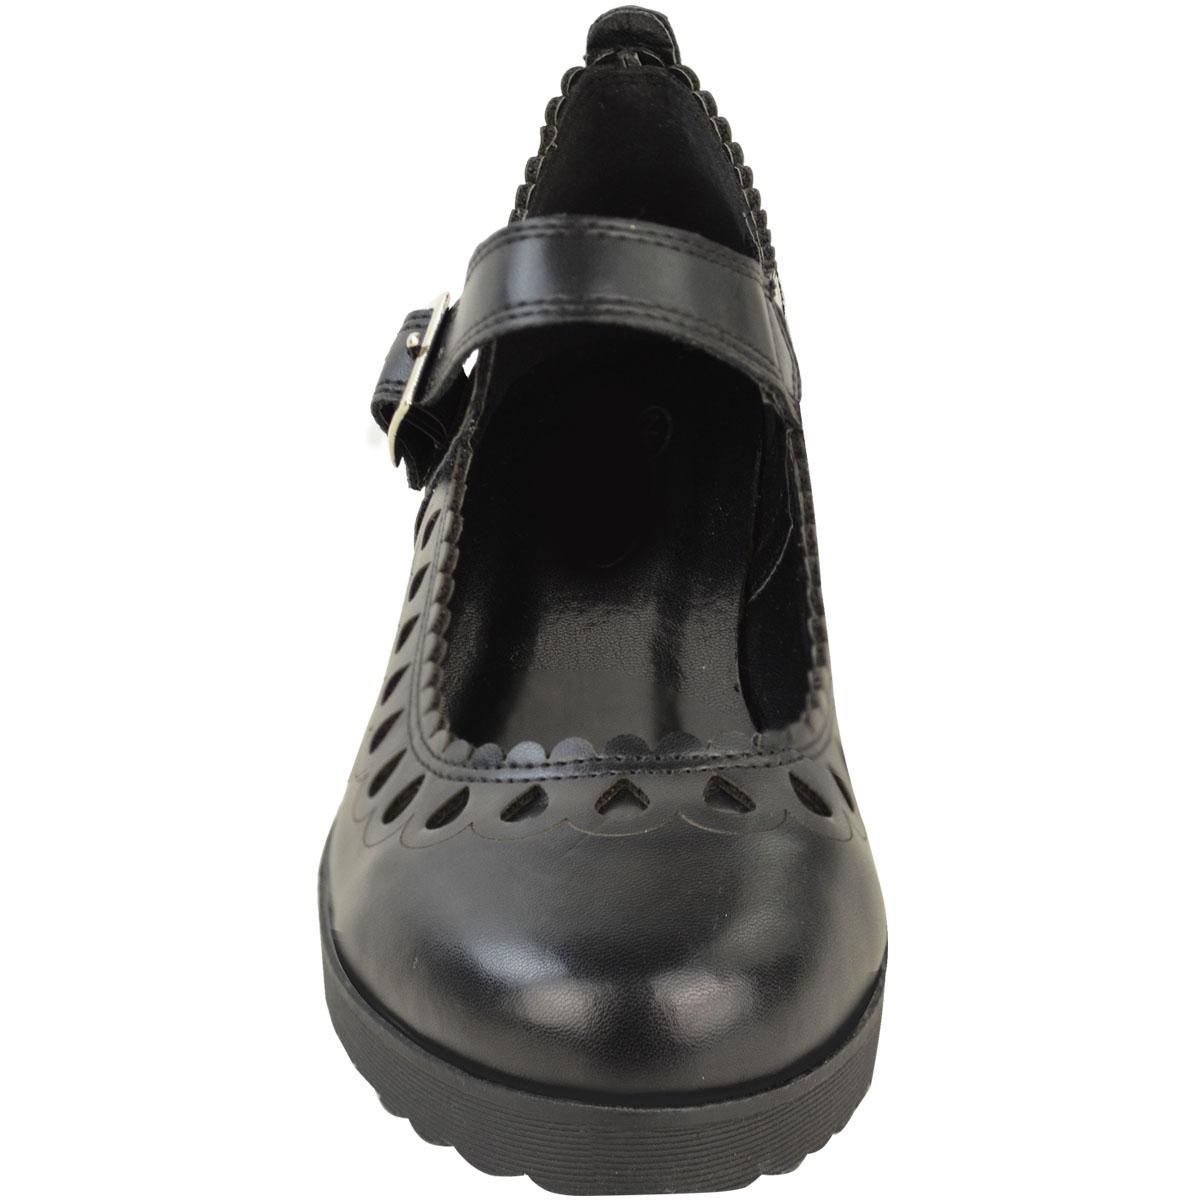 New-Womens-Ladies-Girls-Flats-Shoes-Pumps-School-Work-Office-Geek-Low-Heels-Size thumbnail 9